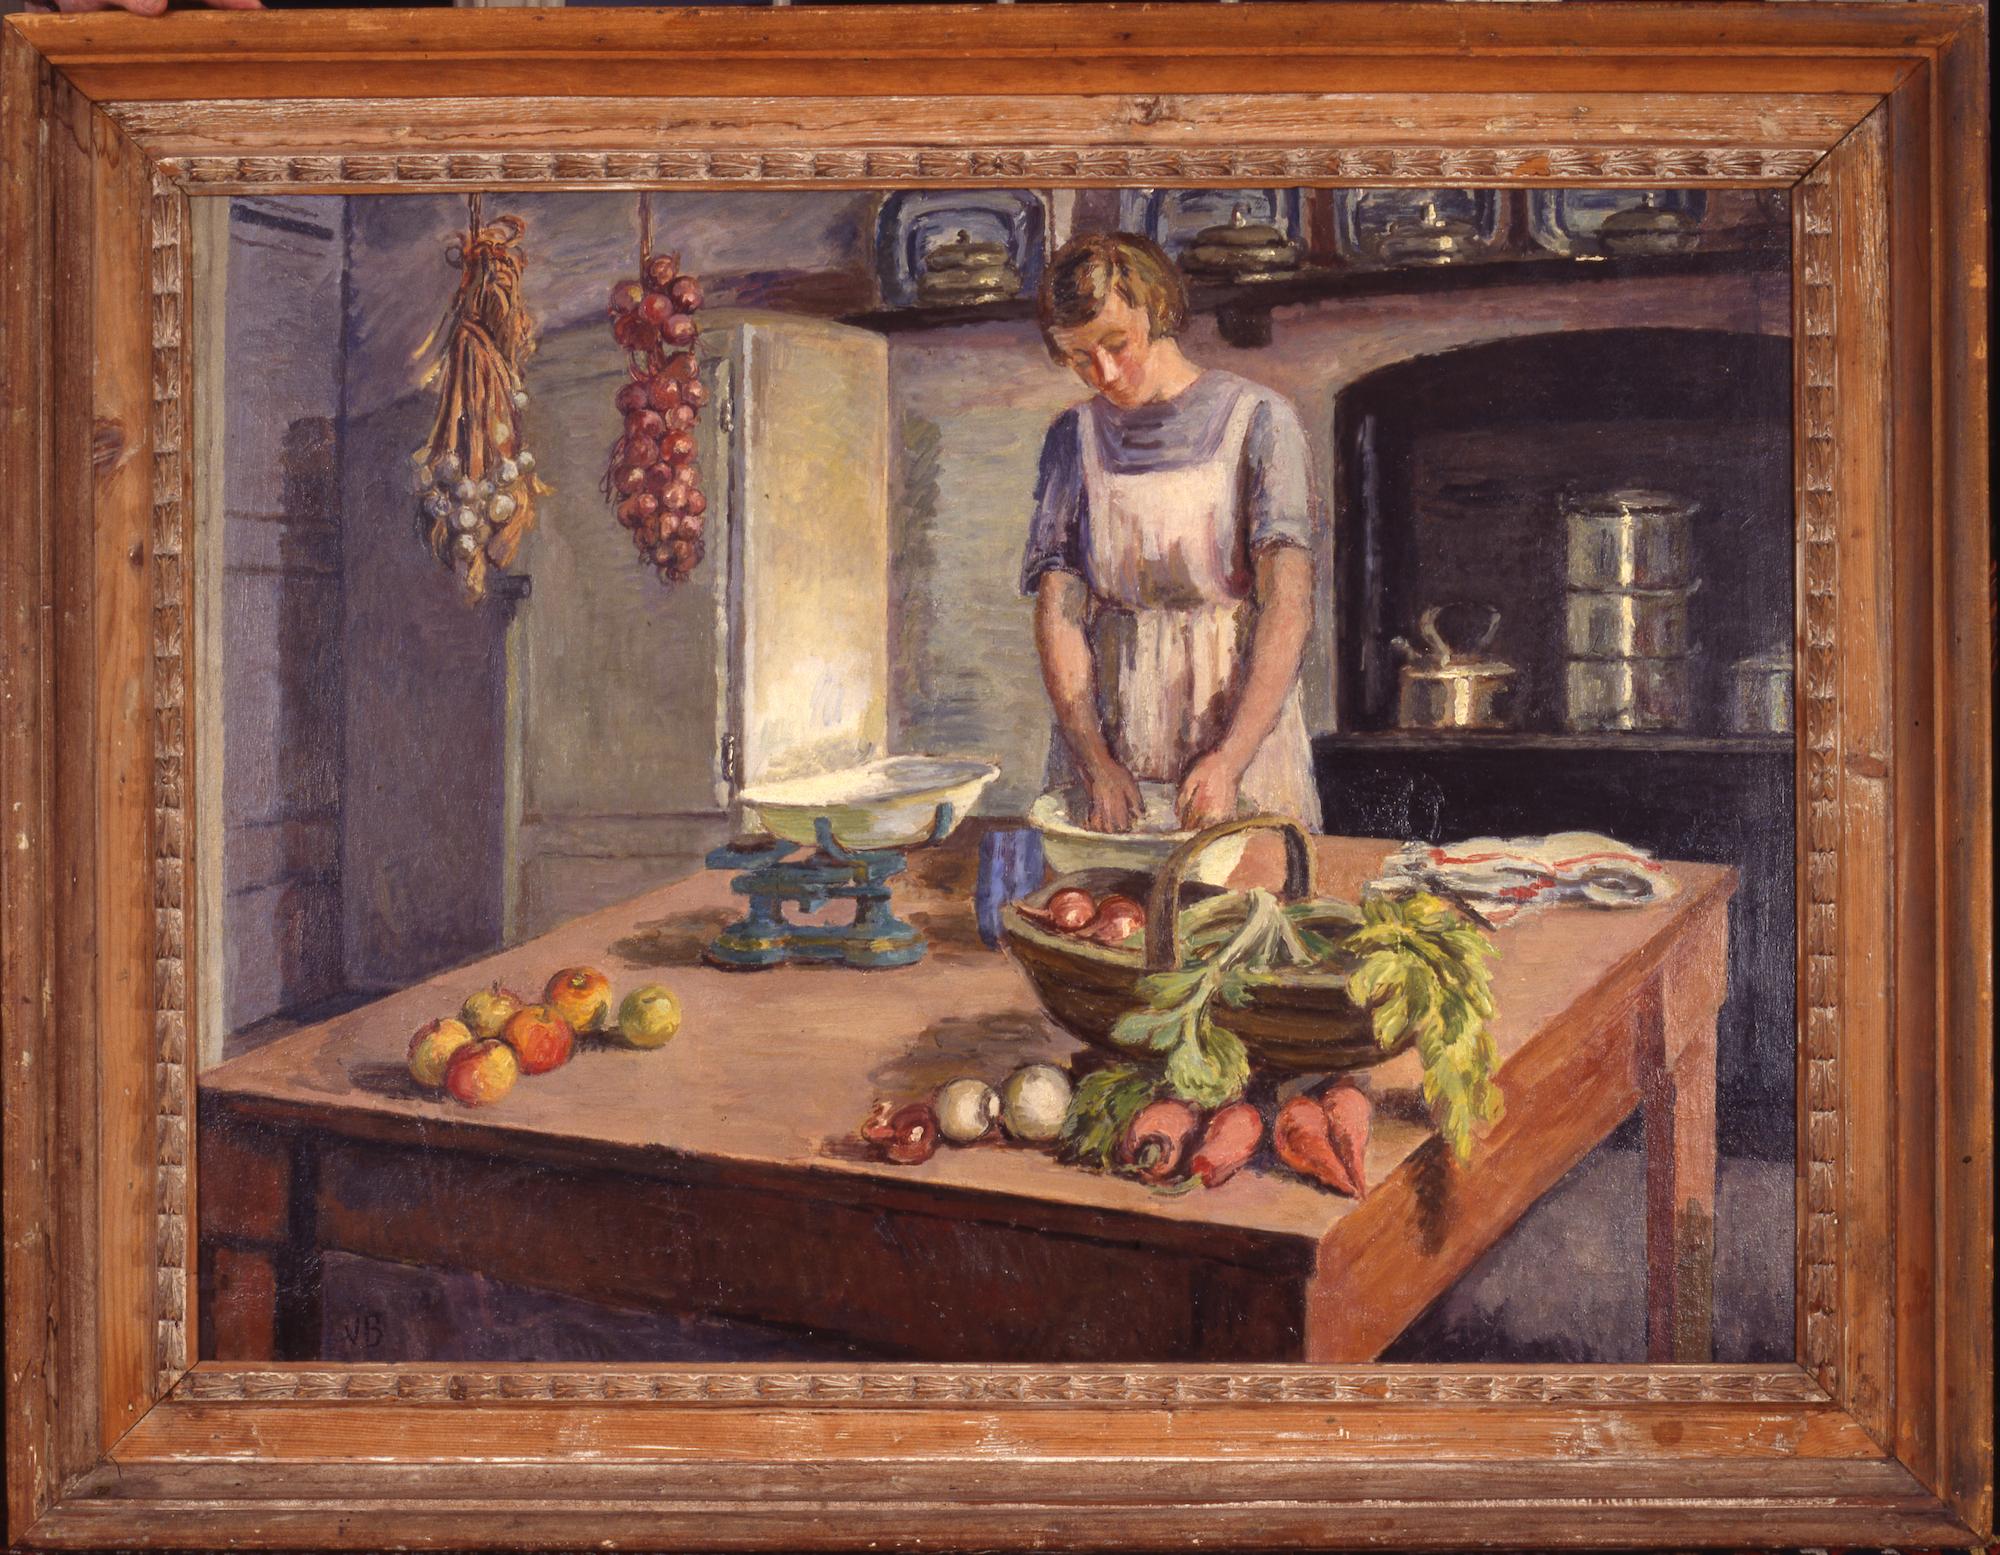 Venessa Bell, The Kitchen at Charleston, c.1943. © Estate of Vanessa Bell. All rights reserved, DACS 2021, Photo: Charleston Trust